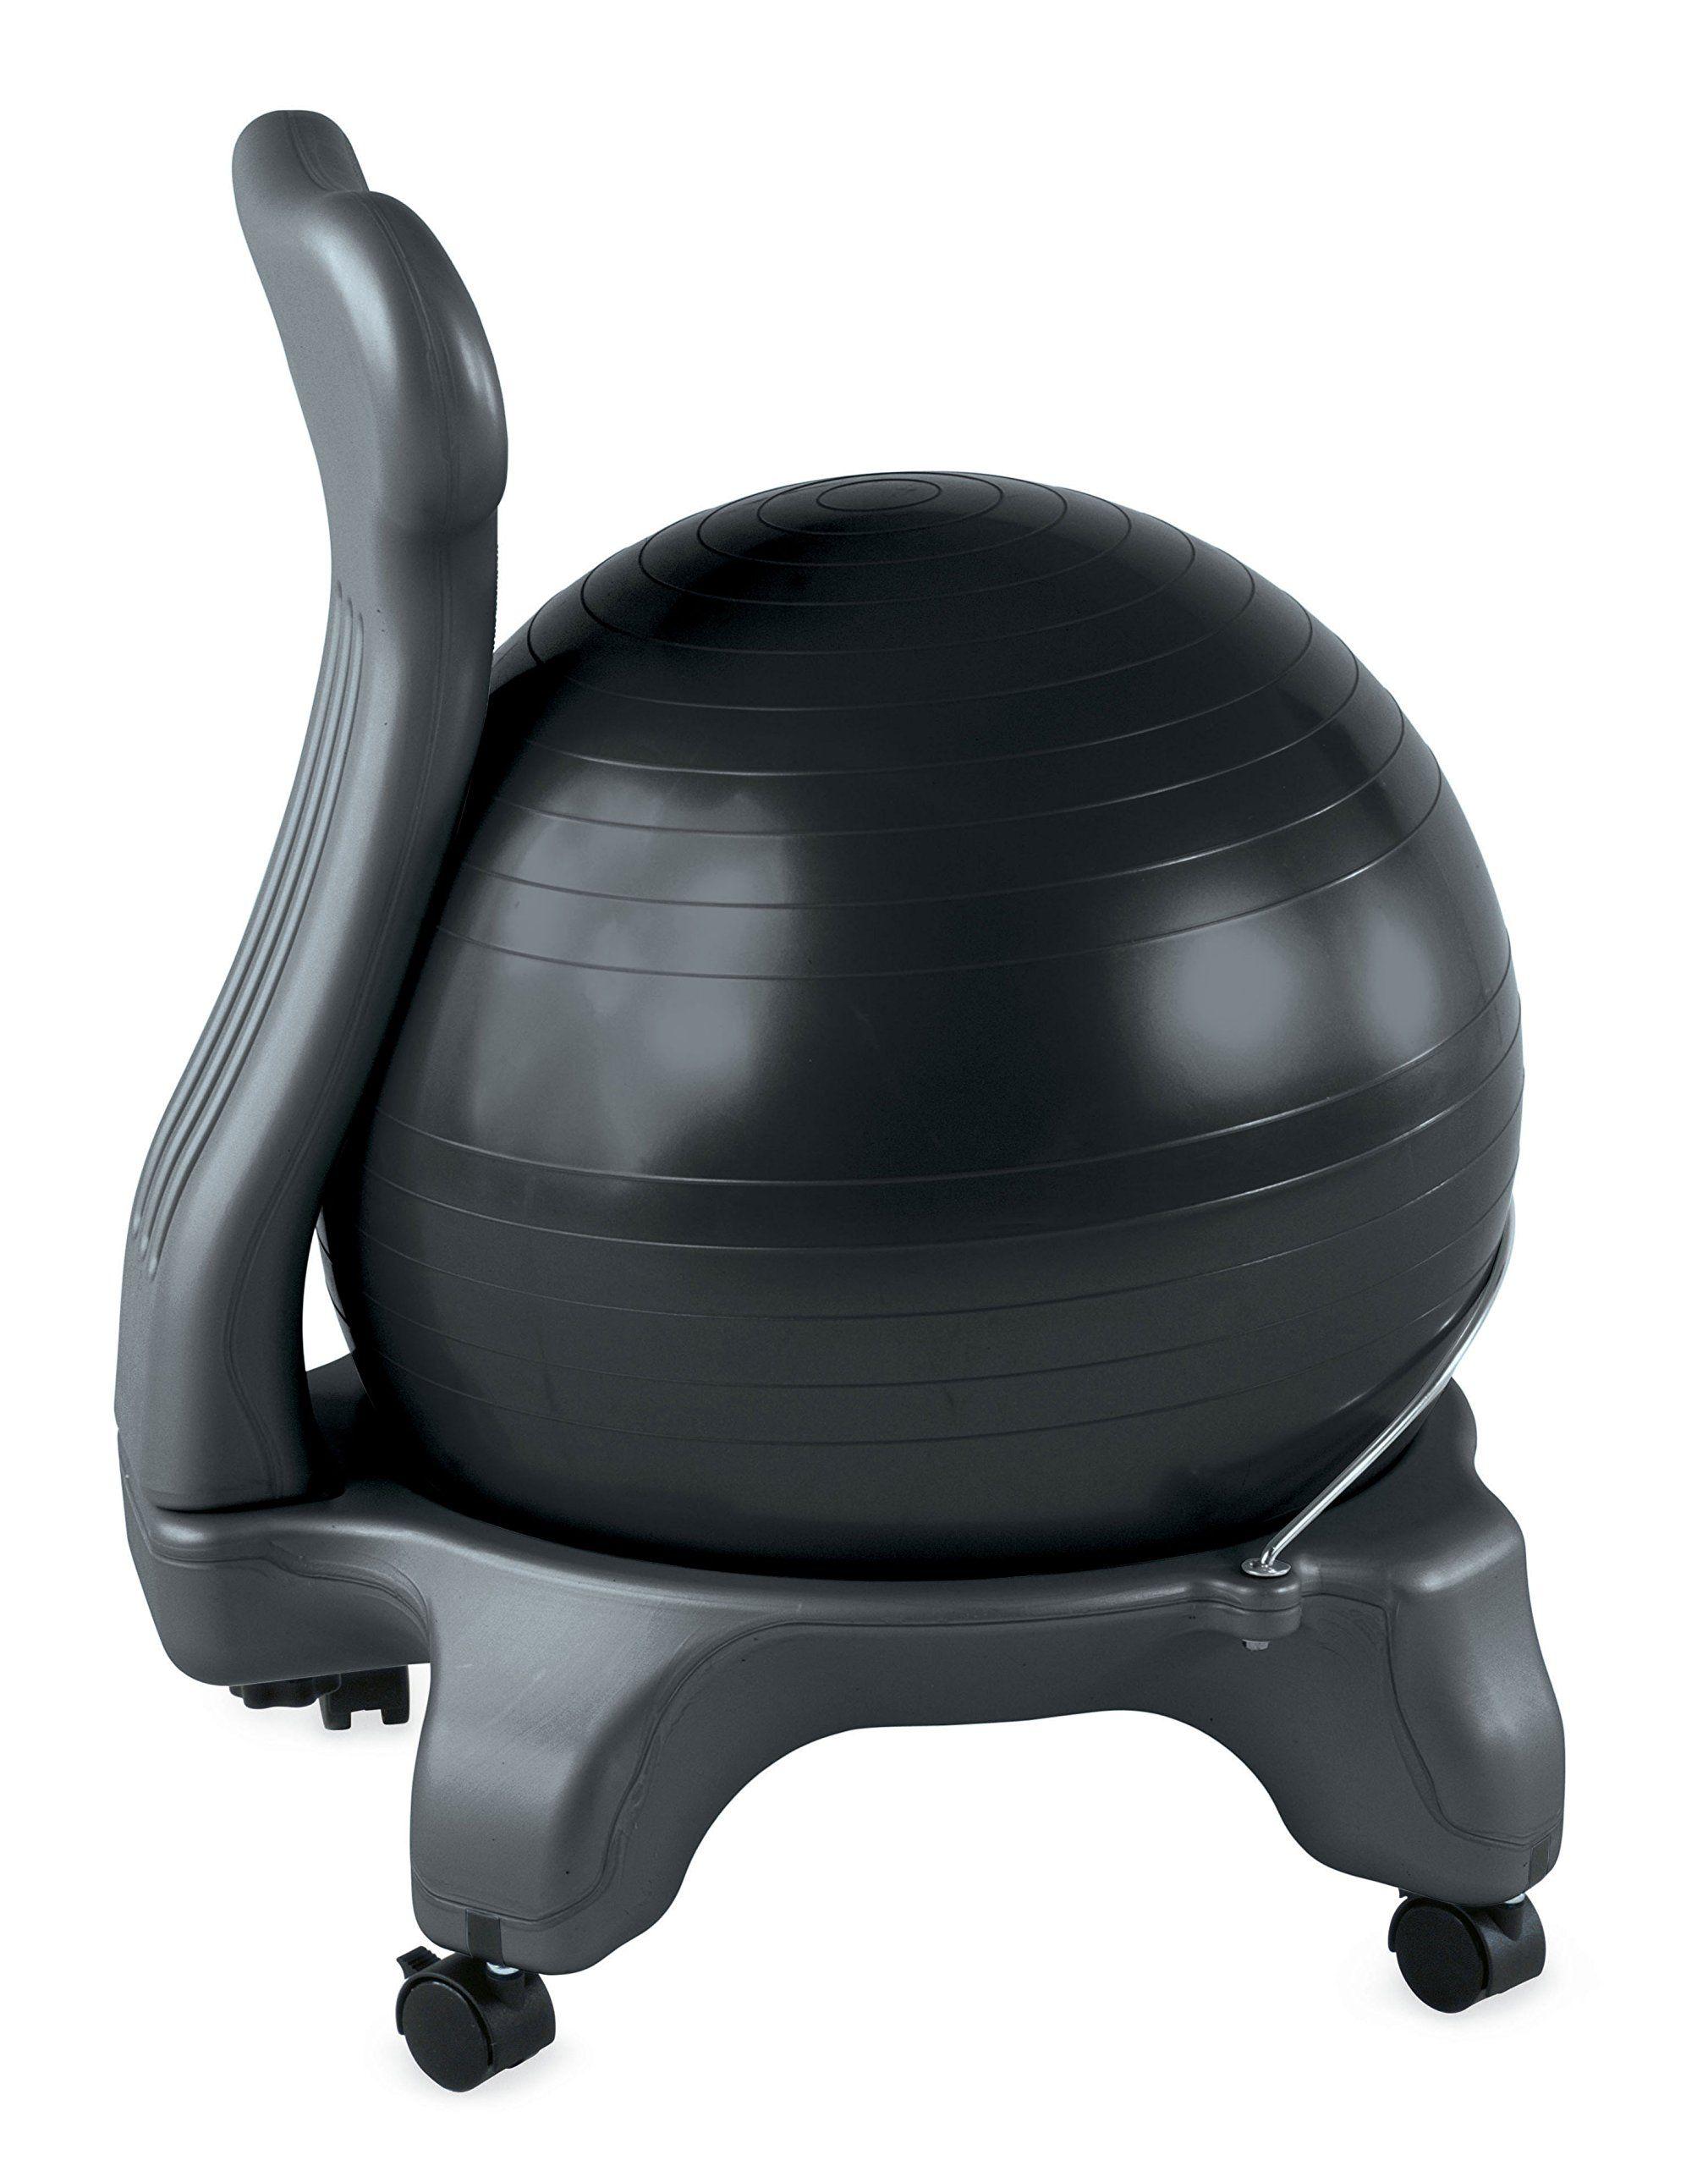 Gym Ball Chair Wedding Covers Alibaba Amazonsmile Gaiam Balance Black Exercise Balls Sports Outdoors